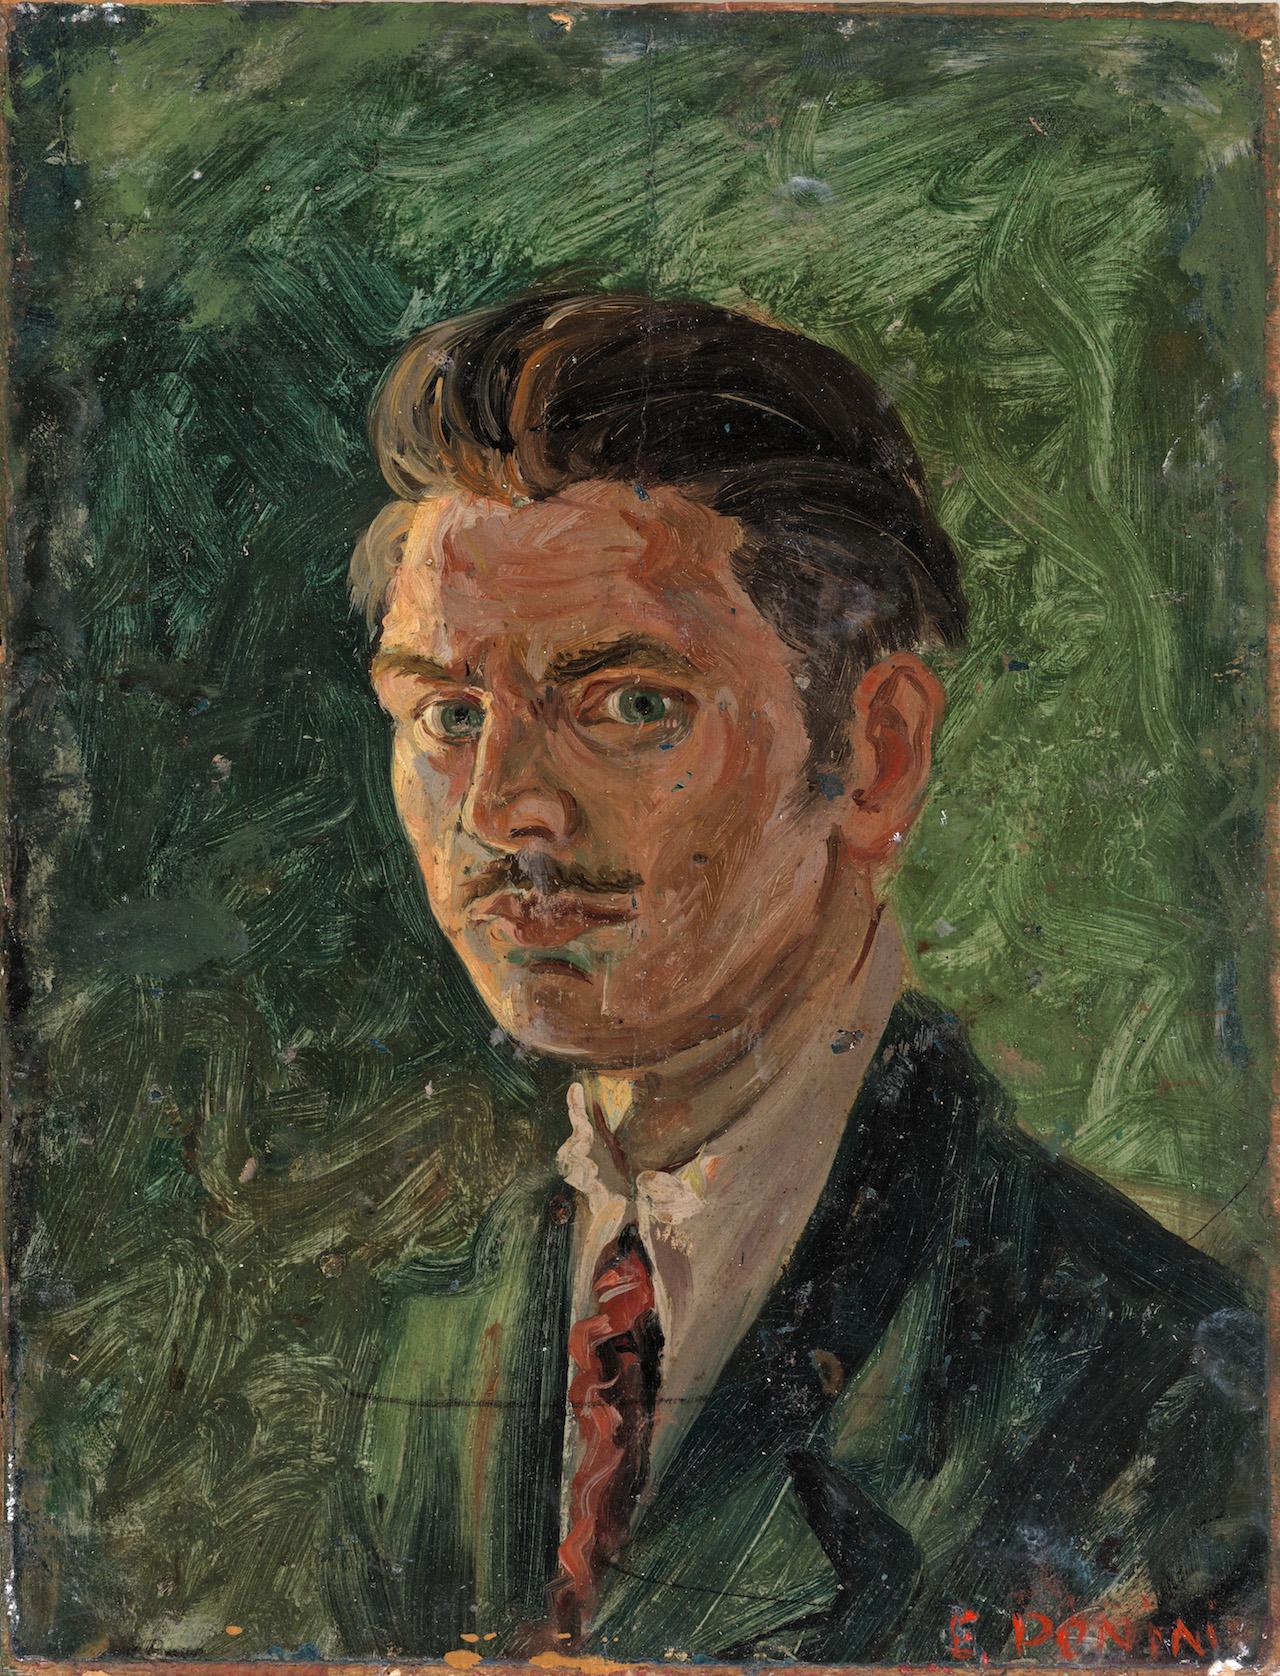 Autoritratto, 1937, olio su tavola, 30x23 cm